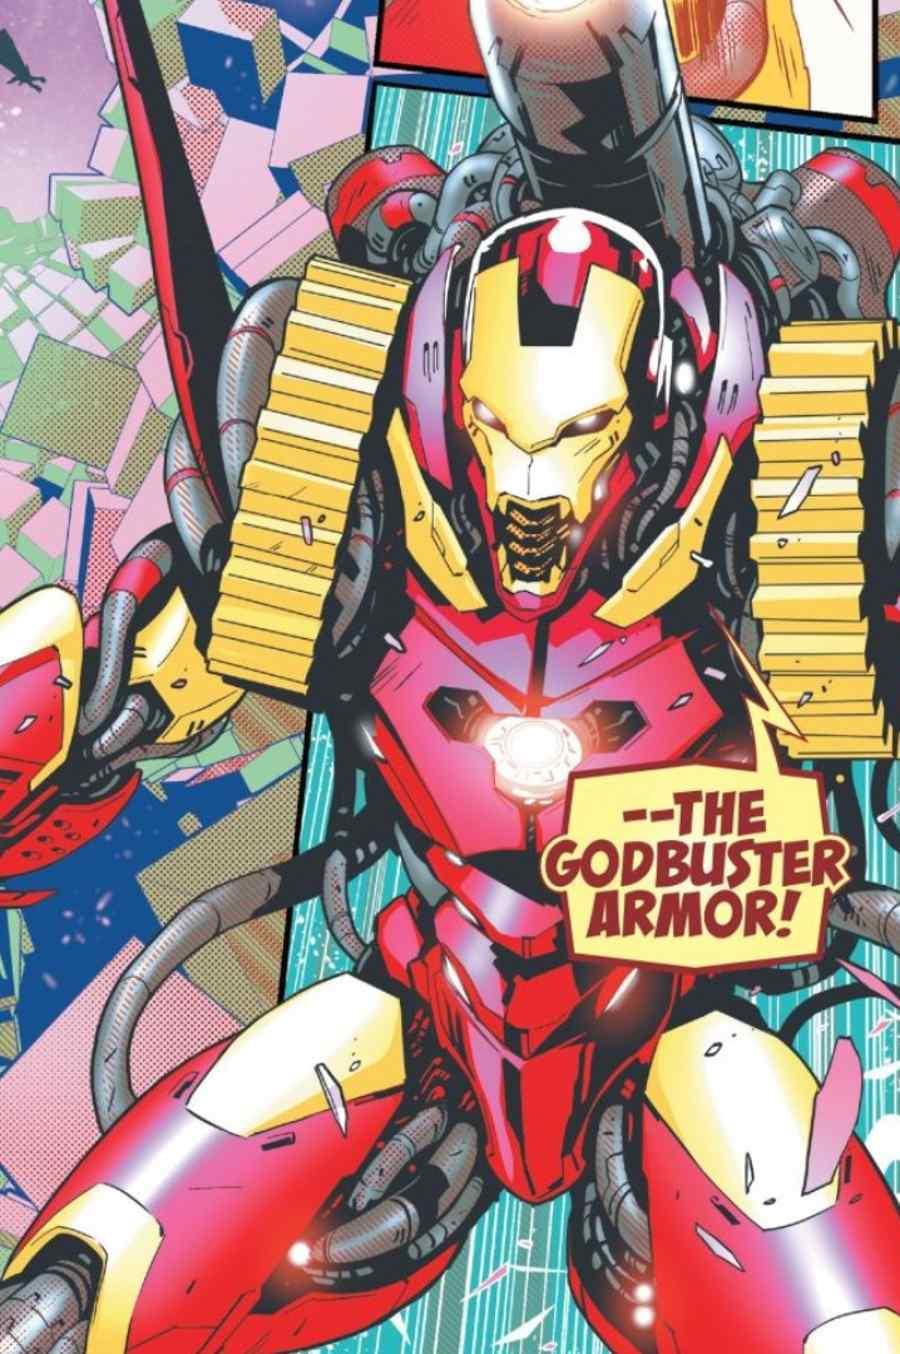 Marvel Debuts New Iron Man Godbuster Armor